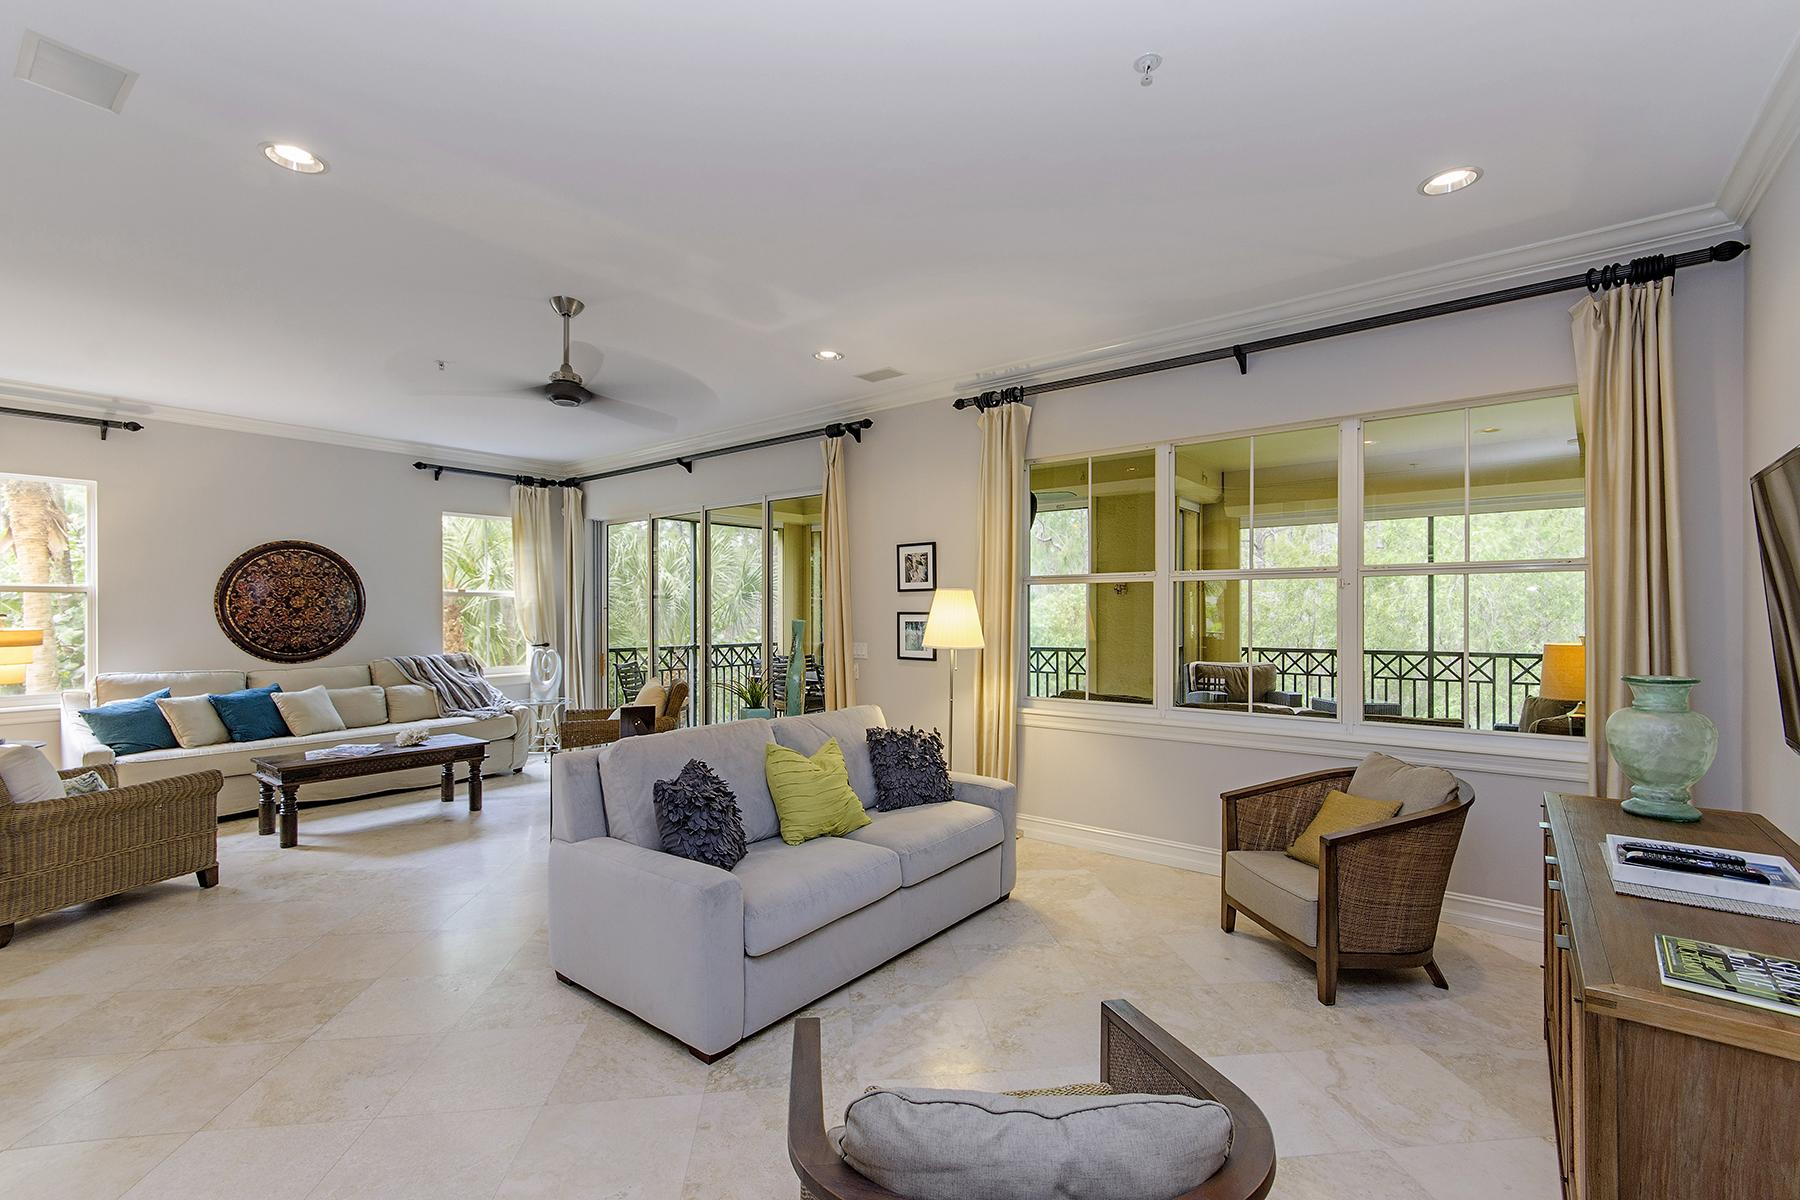 Condominium for Sale at Naples 2805 Tiburon Blvd E 1-102, Naples, Florida 34109 United States